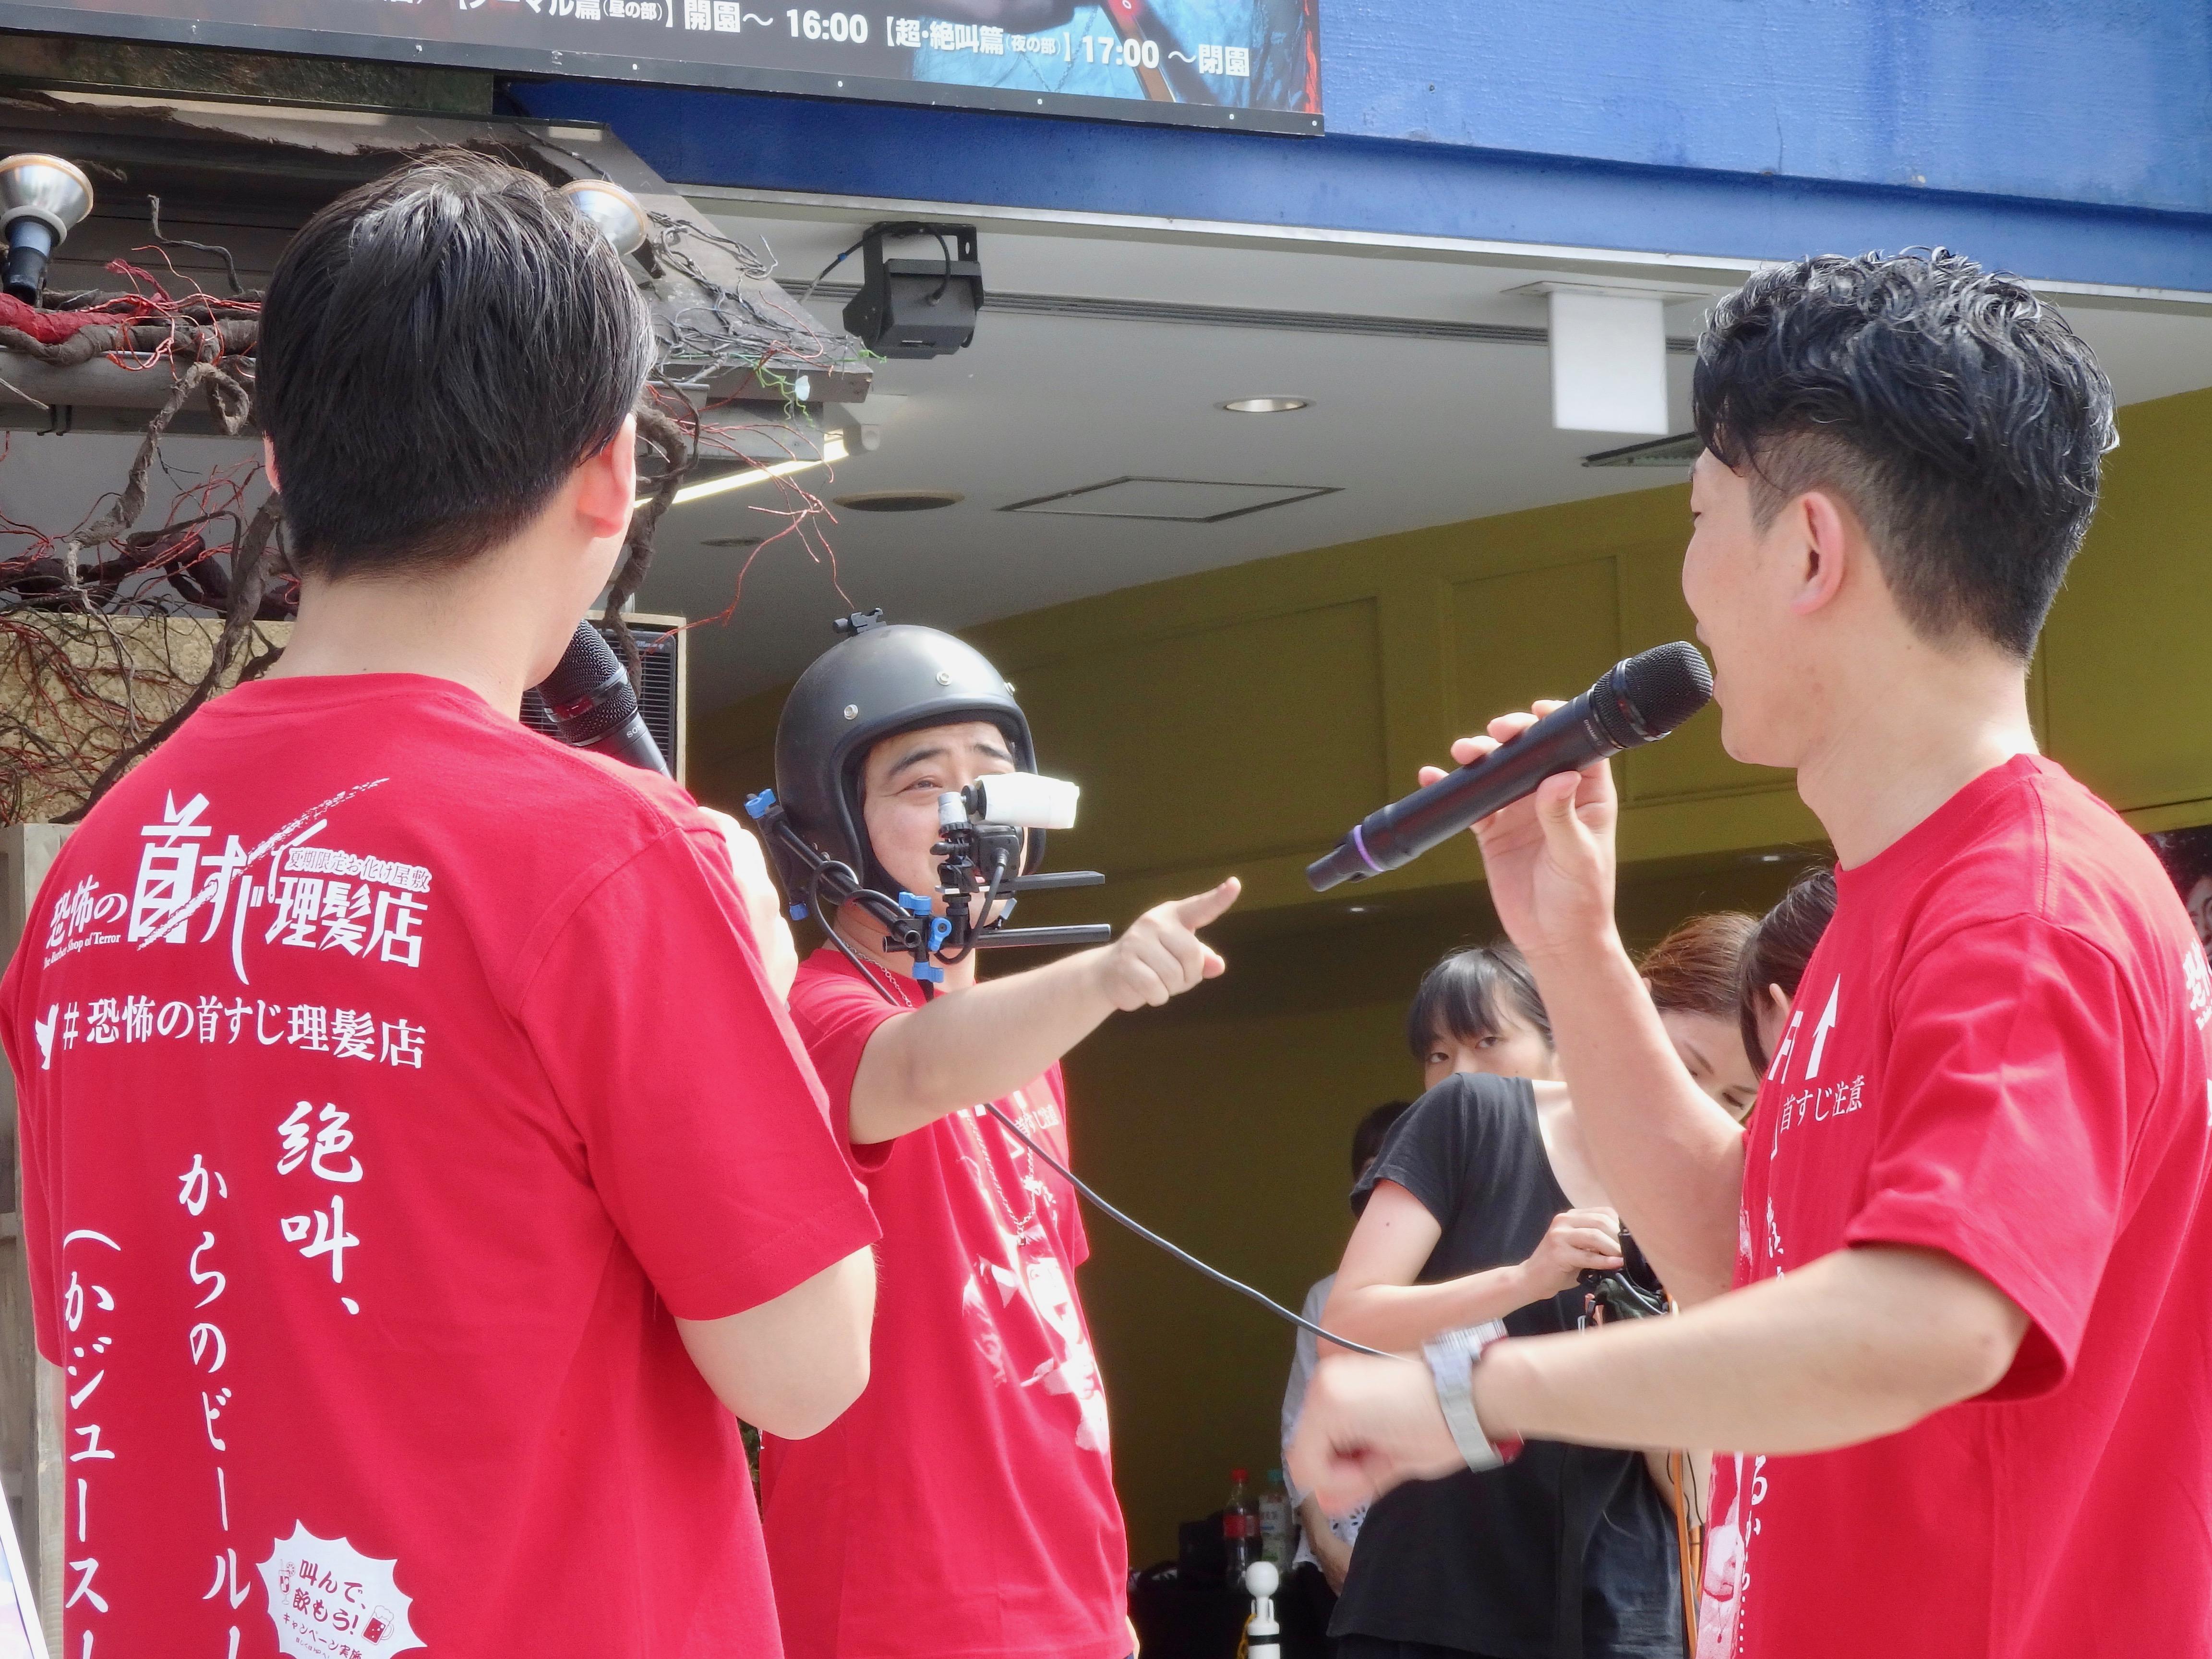 http://news.yoshimoto.co.jp/20170713055751-827d08c1c8204ec491ffcb0c2579c92b50f9df15.jpg